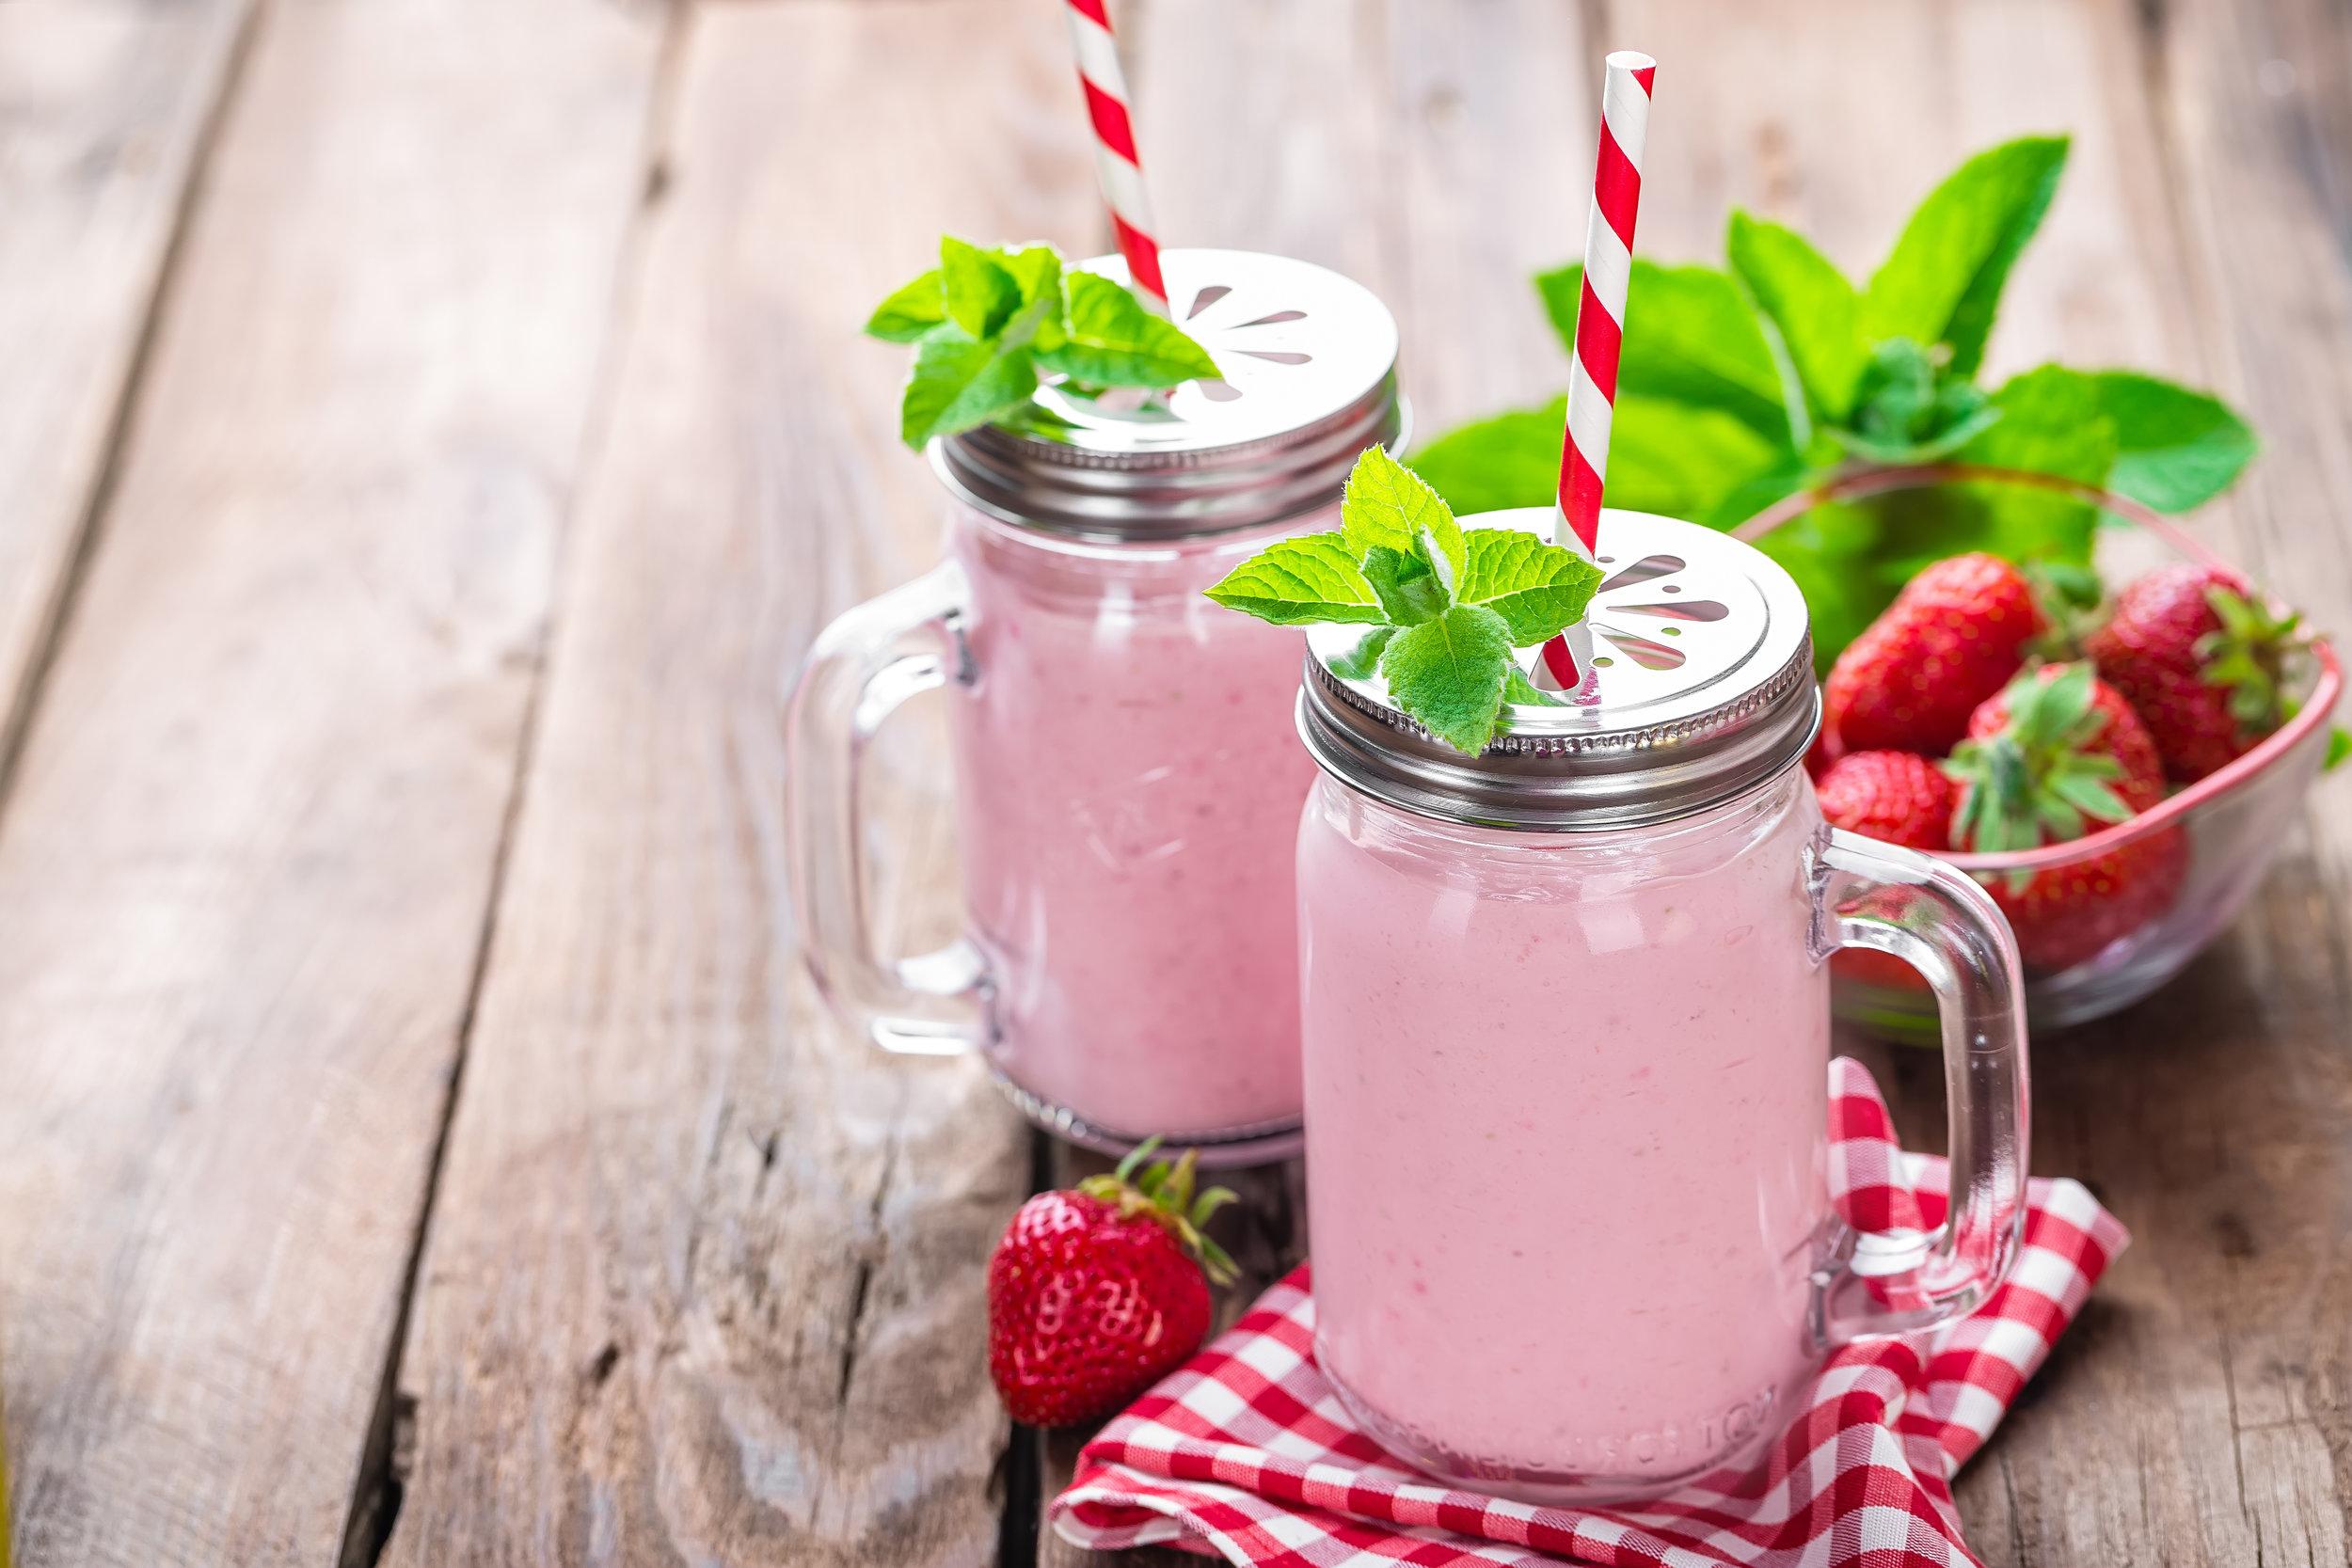 strawberry-smoothie-P9DW85G.jpg